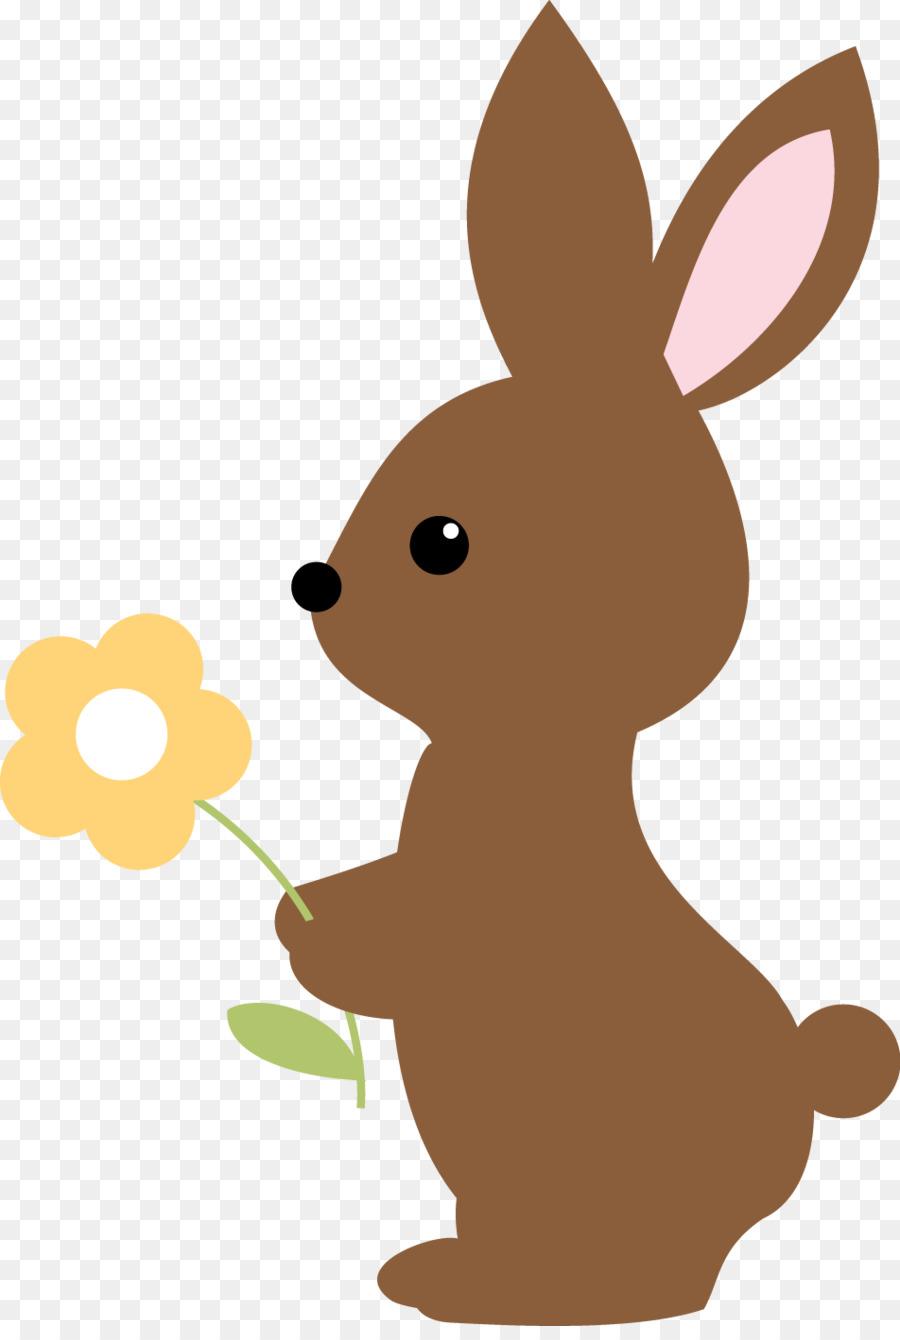 Bunny woodland. Easter background png download